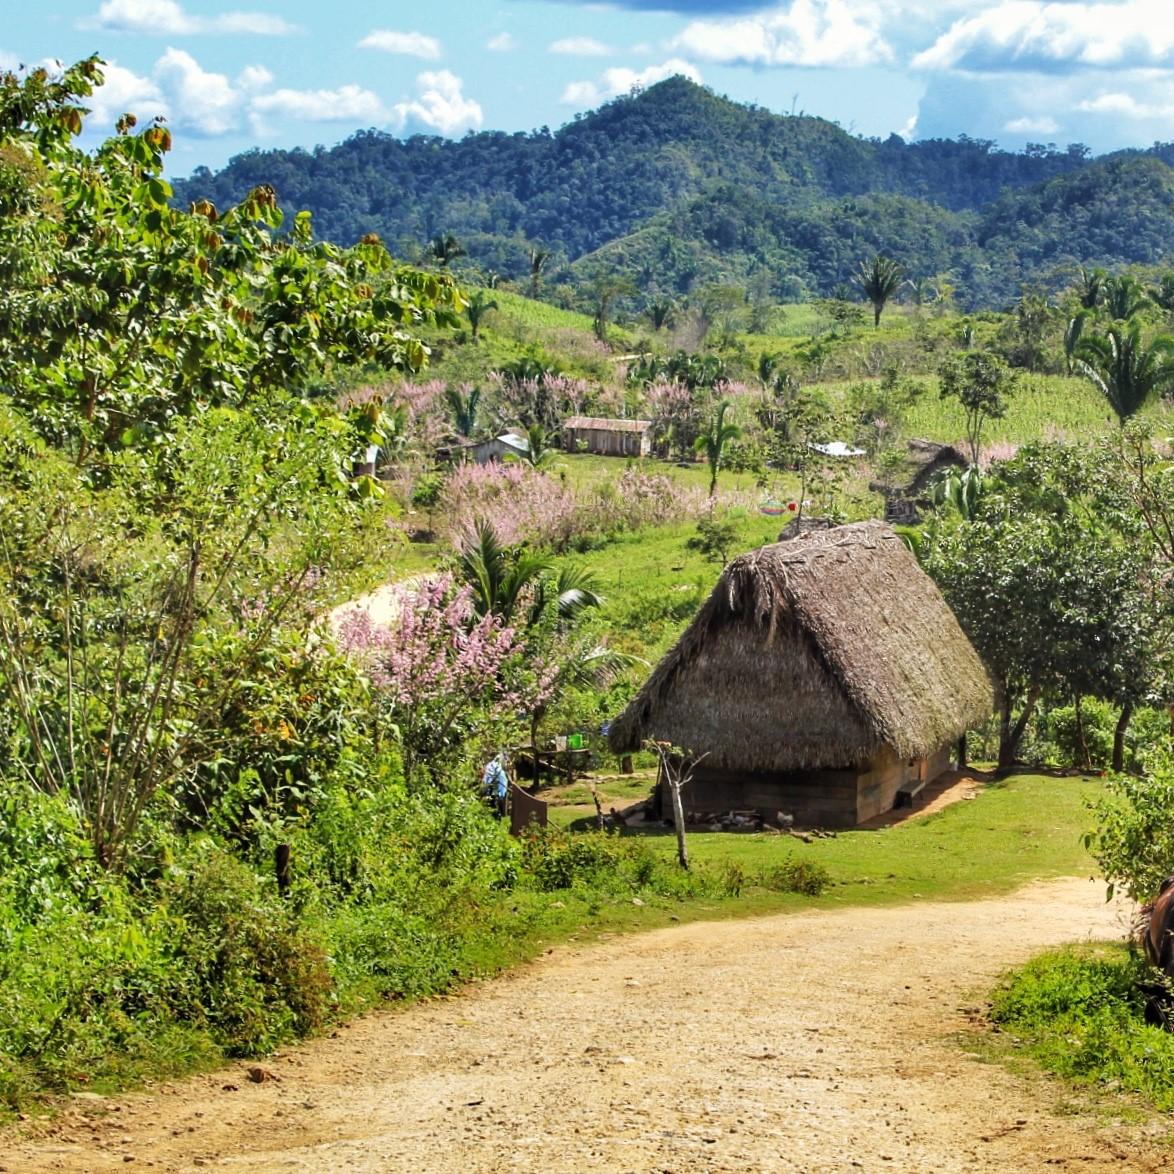 The Village of Jalacte